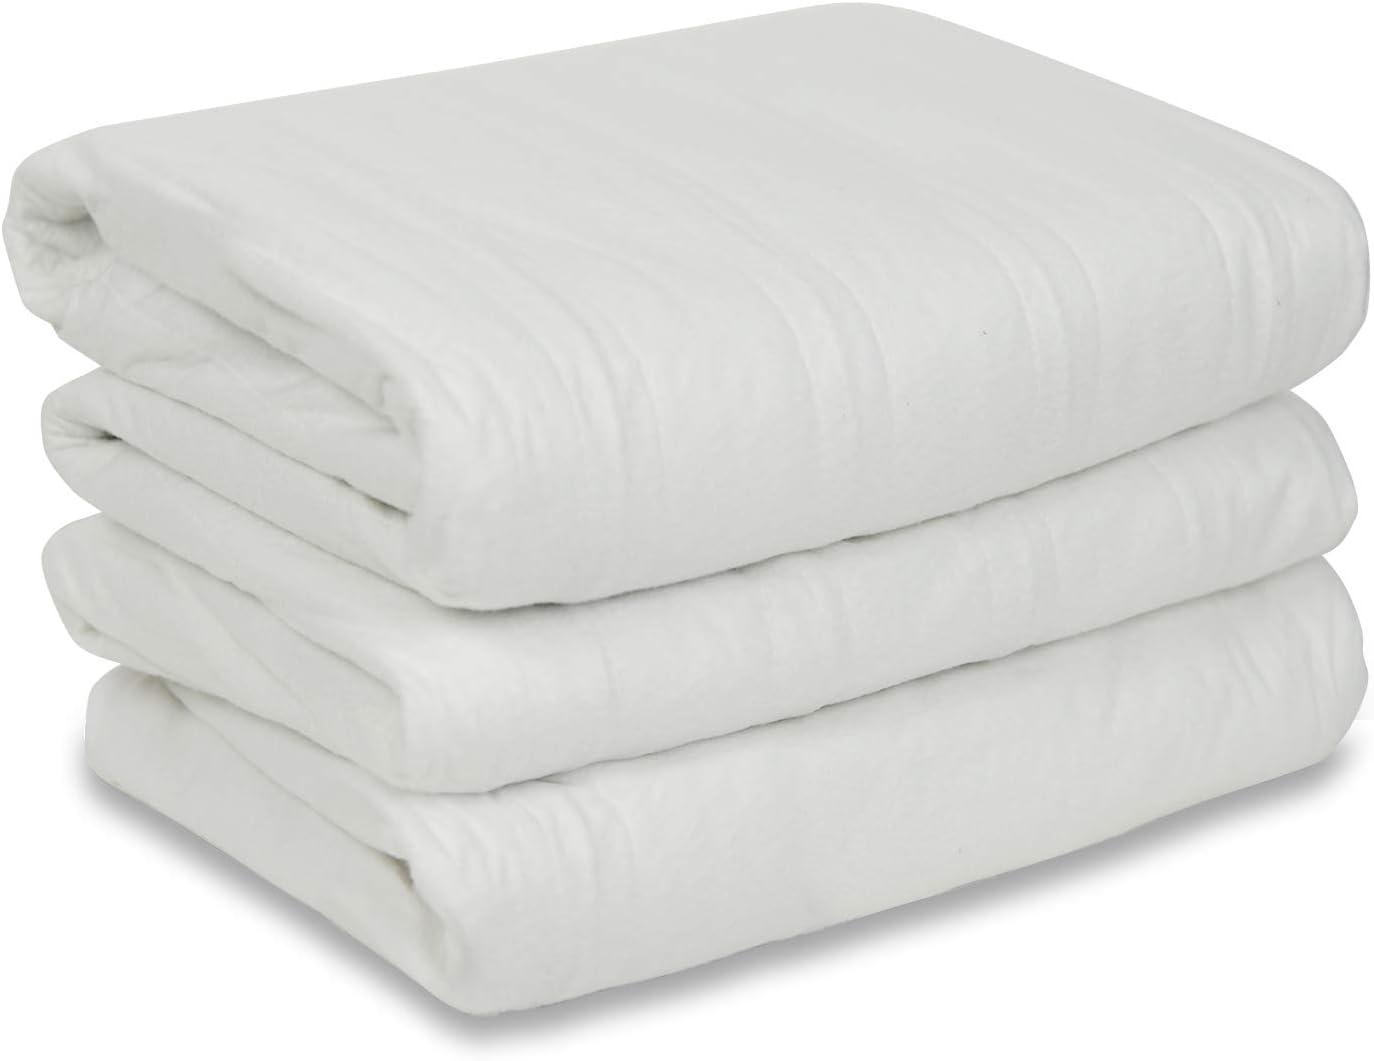 Sunbeam Heated Mattress Pad   Polyester, 10 Heat Settings,White , King - MSU1GKS-N000-11A00: Home & Kitchen